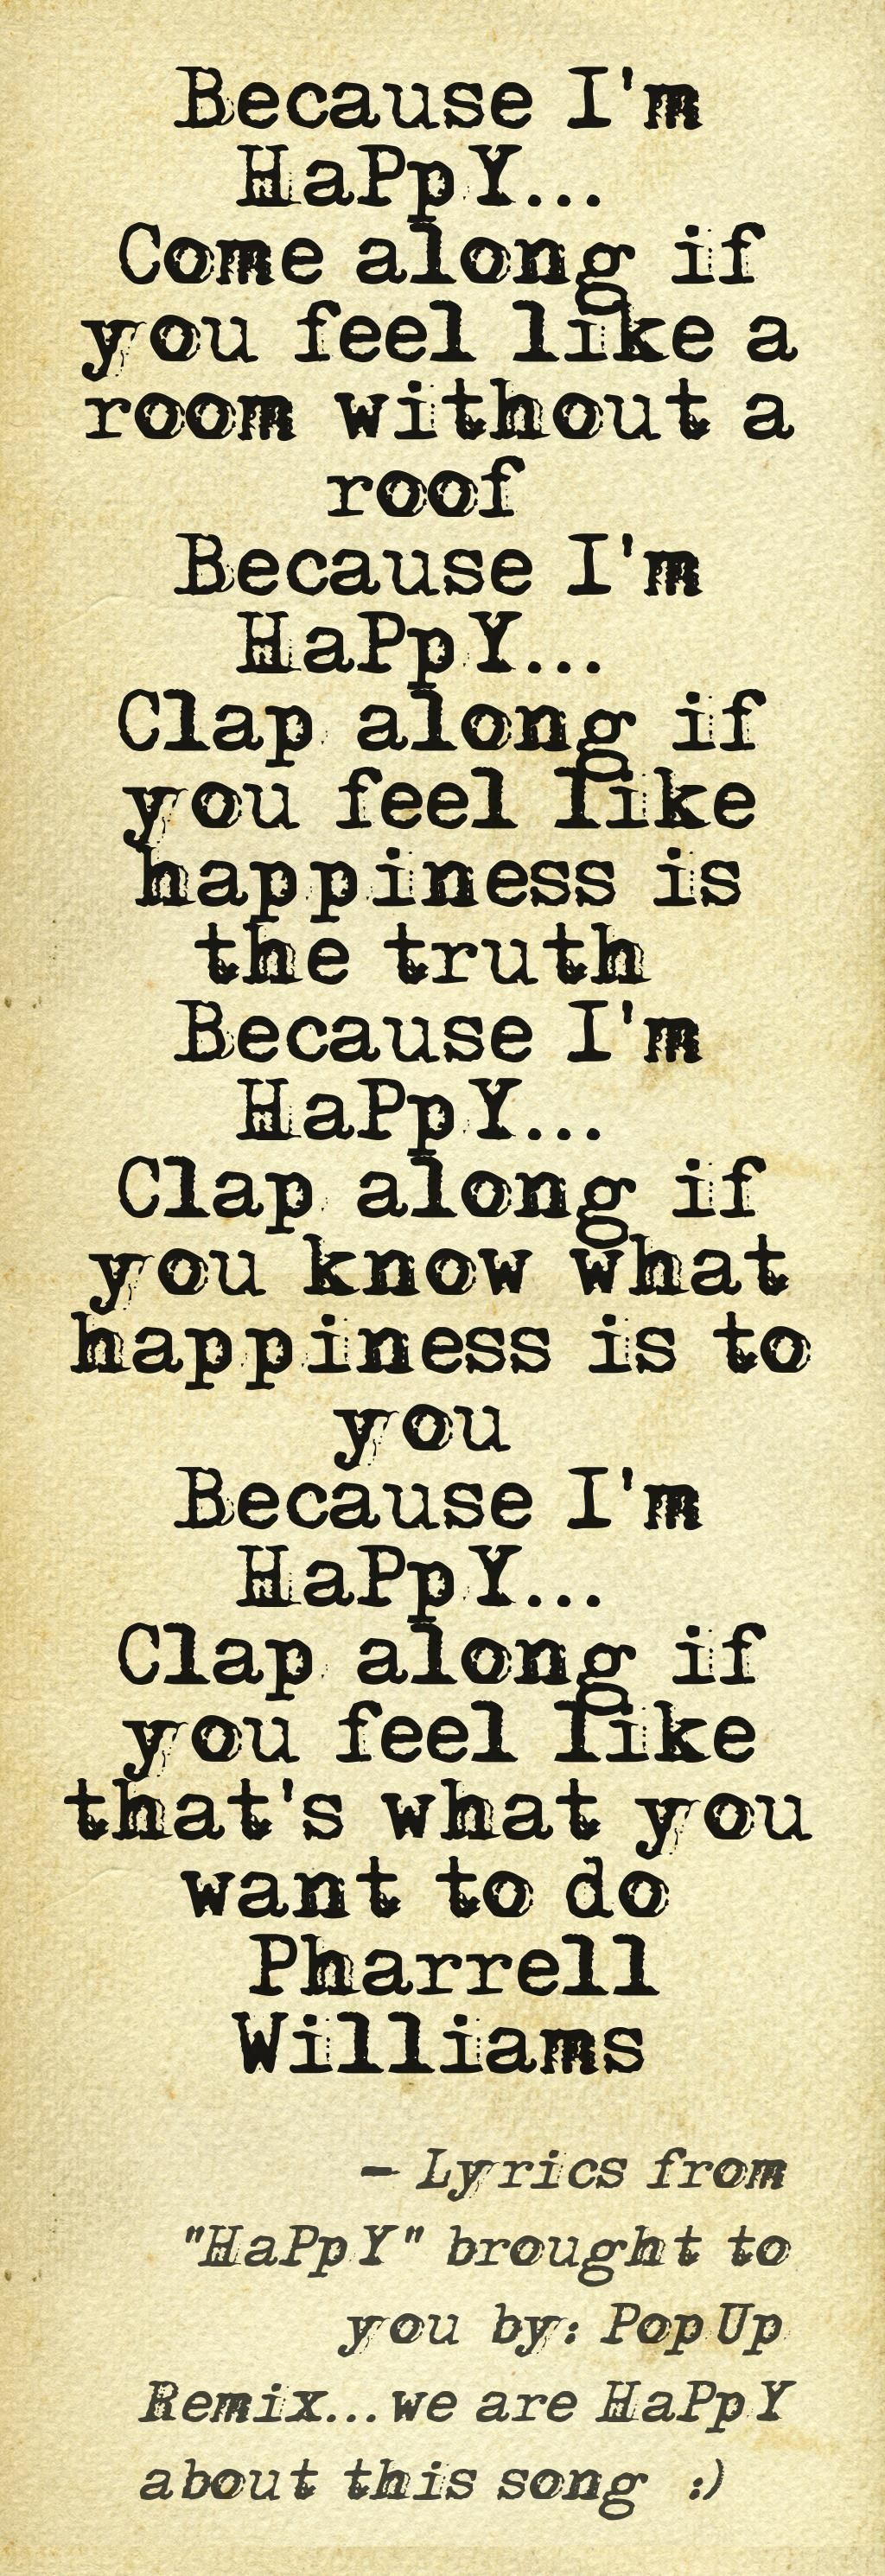 Because I'm Happy - Pharrell Williams here's ur lyrics lol @Casie D D D D D D D D Swanner